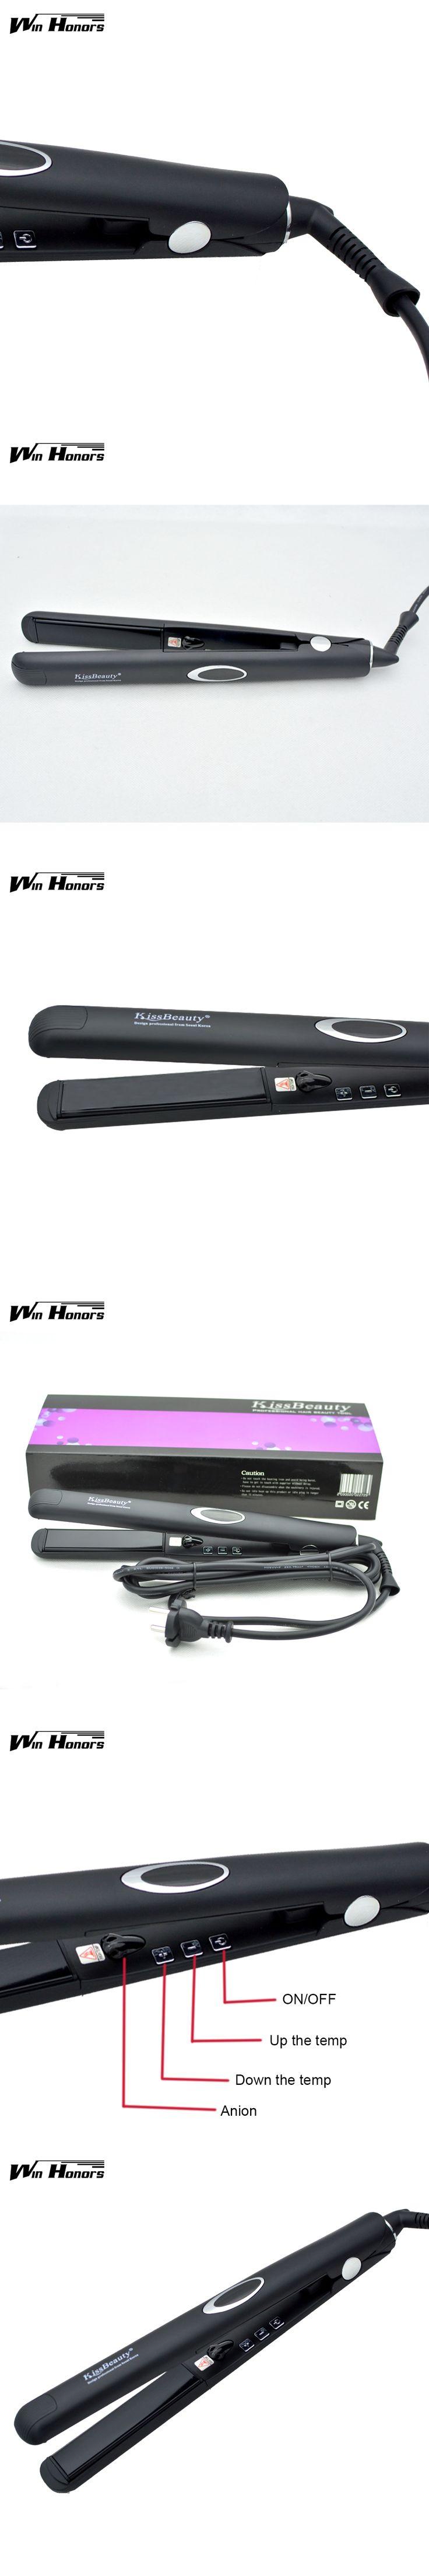 Negative ions Function Flat Iron Tourmaline Ceramic Plate Professional Hair Straightener Black Straightening Irons